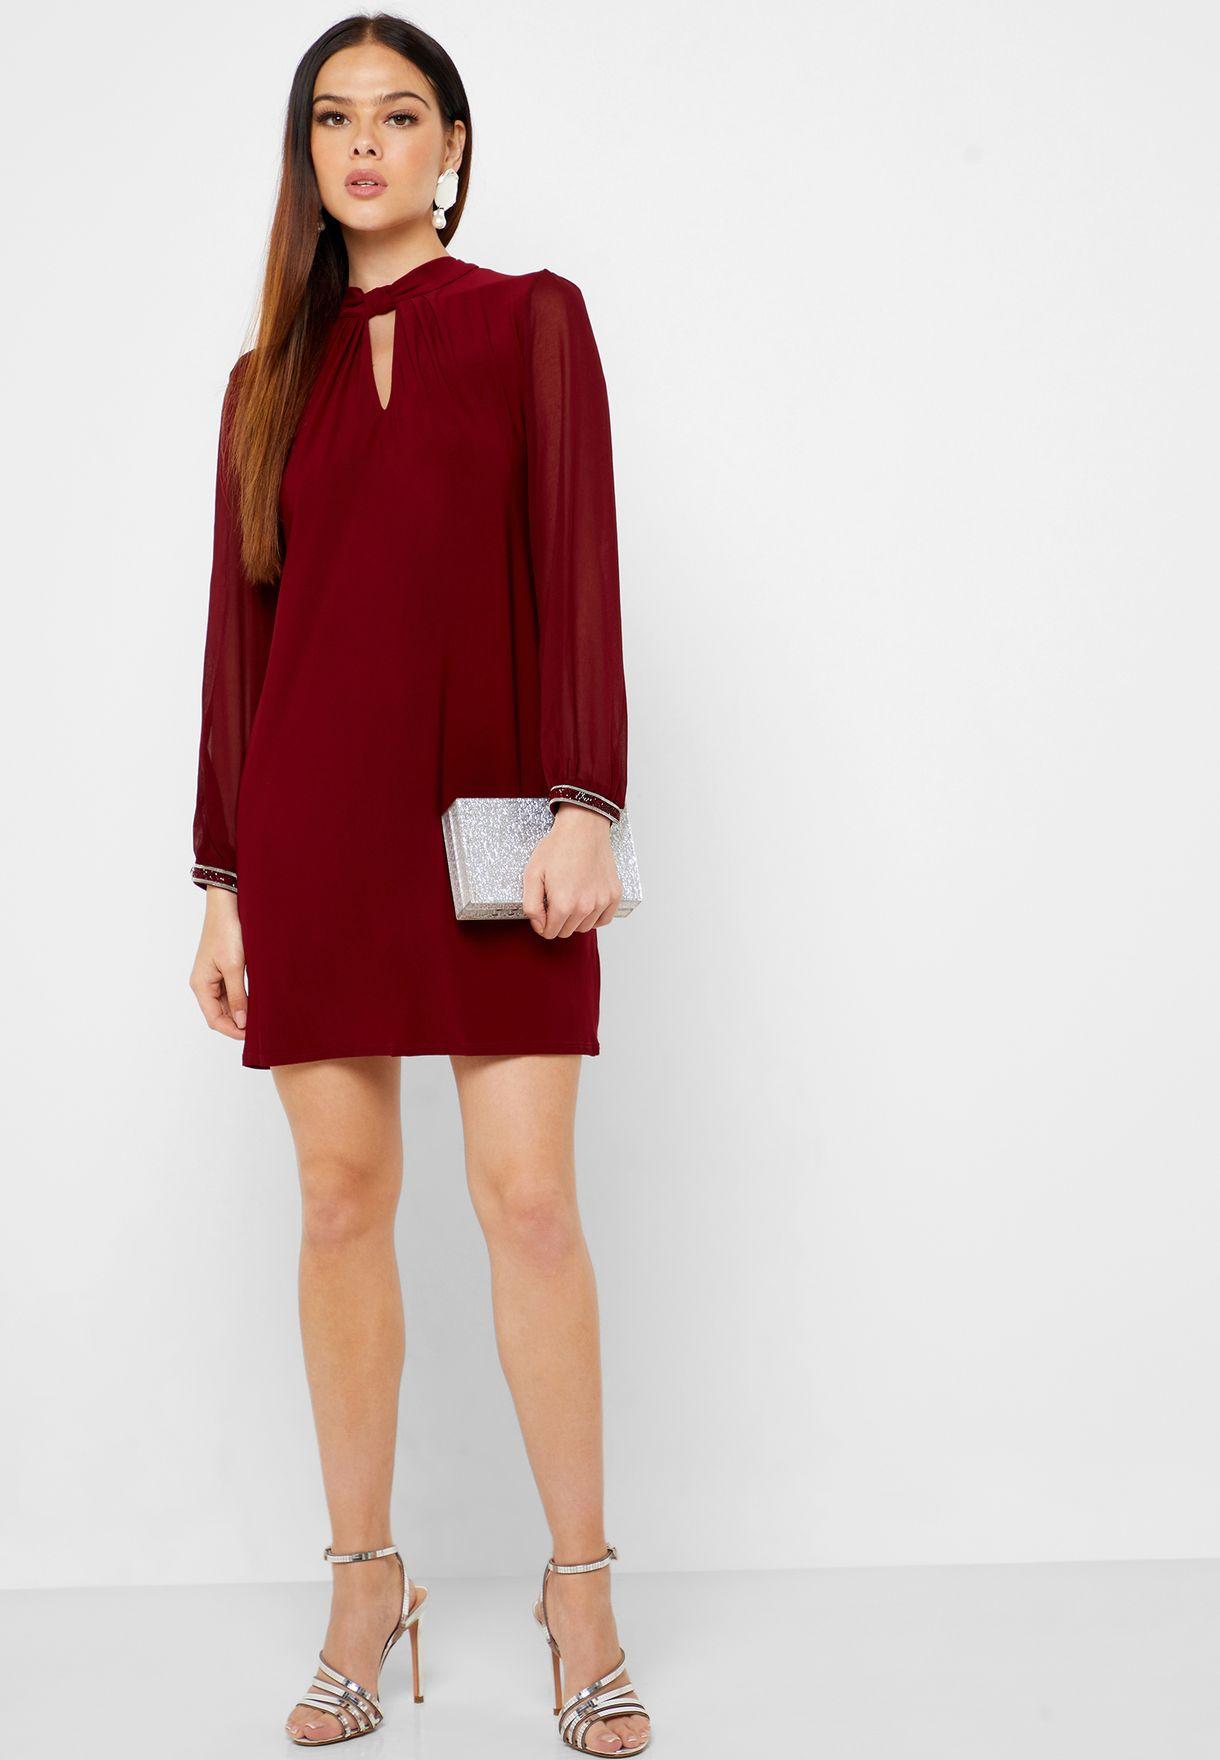 Keyhole High Neck Dress